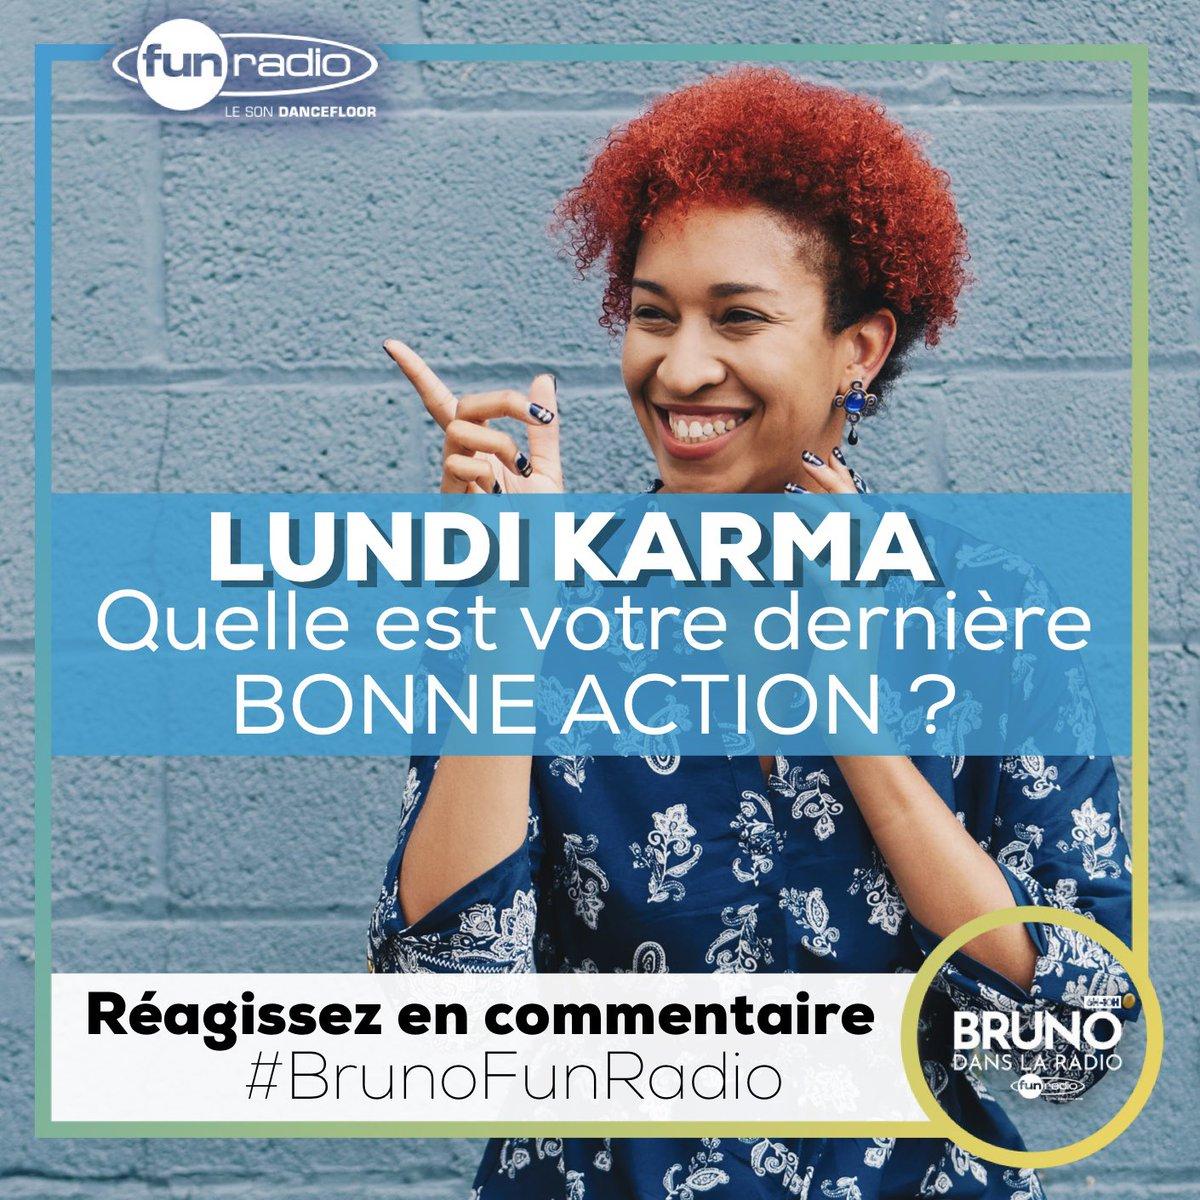 On se partage nos bonnes actions du week-end !  #brunofunradio <br>http://pic.twitter.com/ZPgbLW0SMB